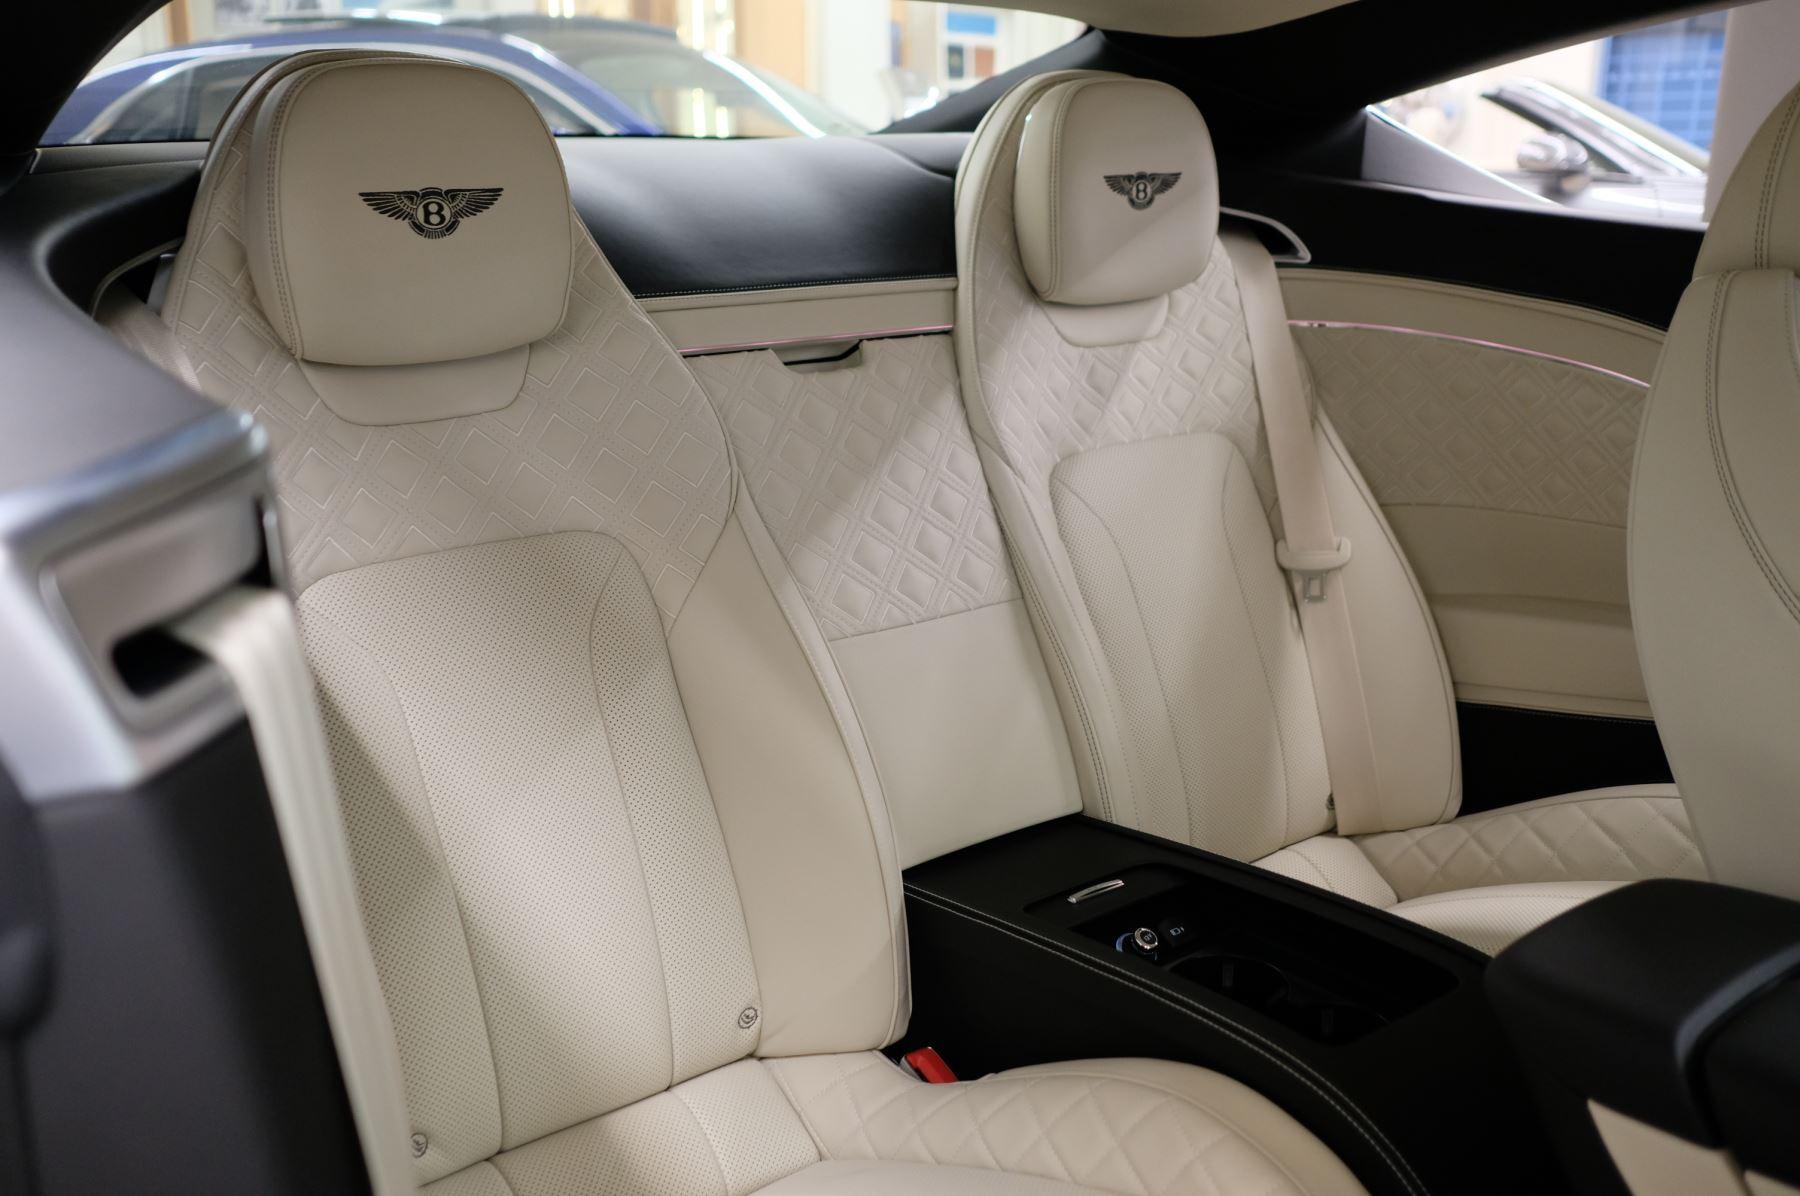 Bentley Continental GT 4.0 V8 Mulliner Driving Spec 2dr Auto [Tour Spec] image 12